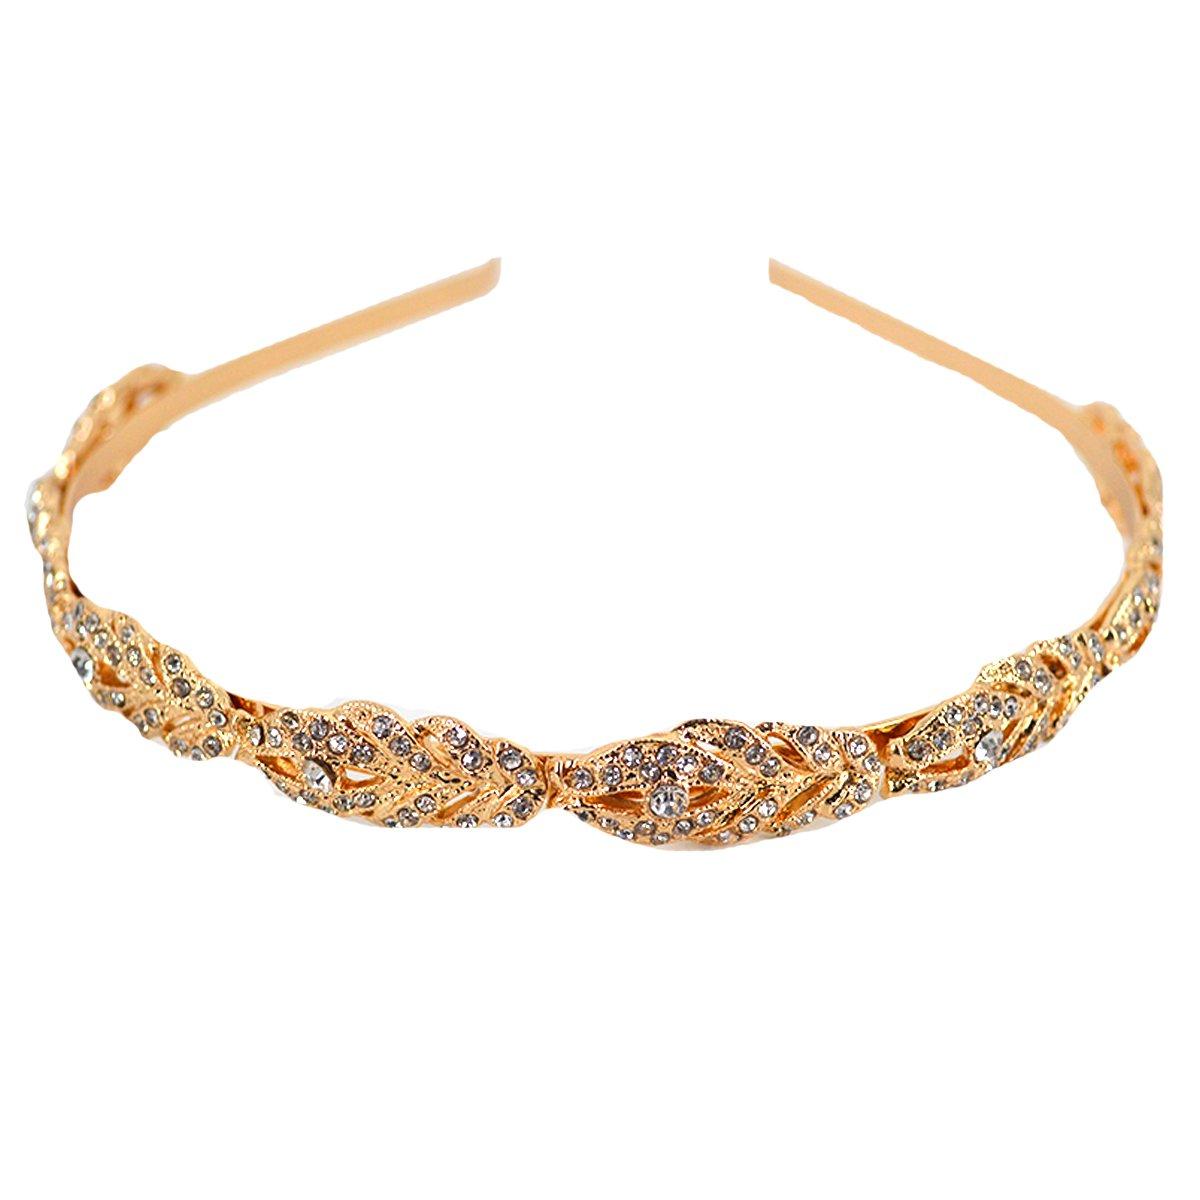 Sherry Headband Bridal Bridesmaid Flower Girl Crystal Hair Band Wedding Tiara Hair Accessories (Gold)